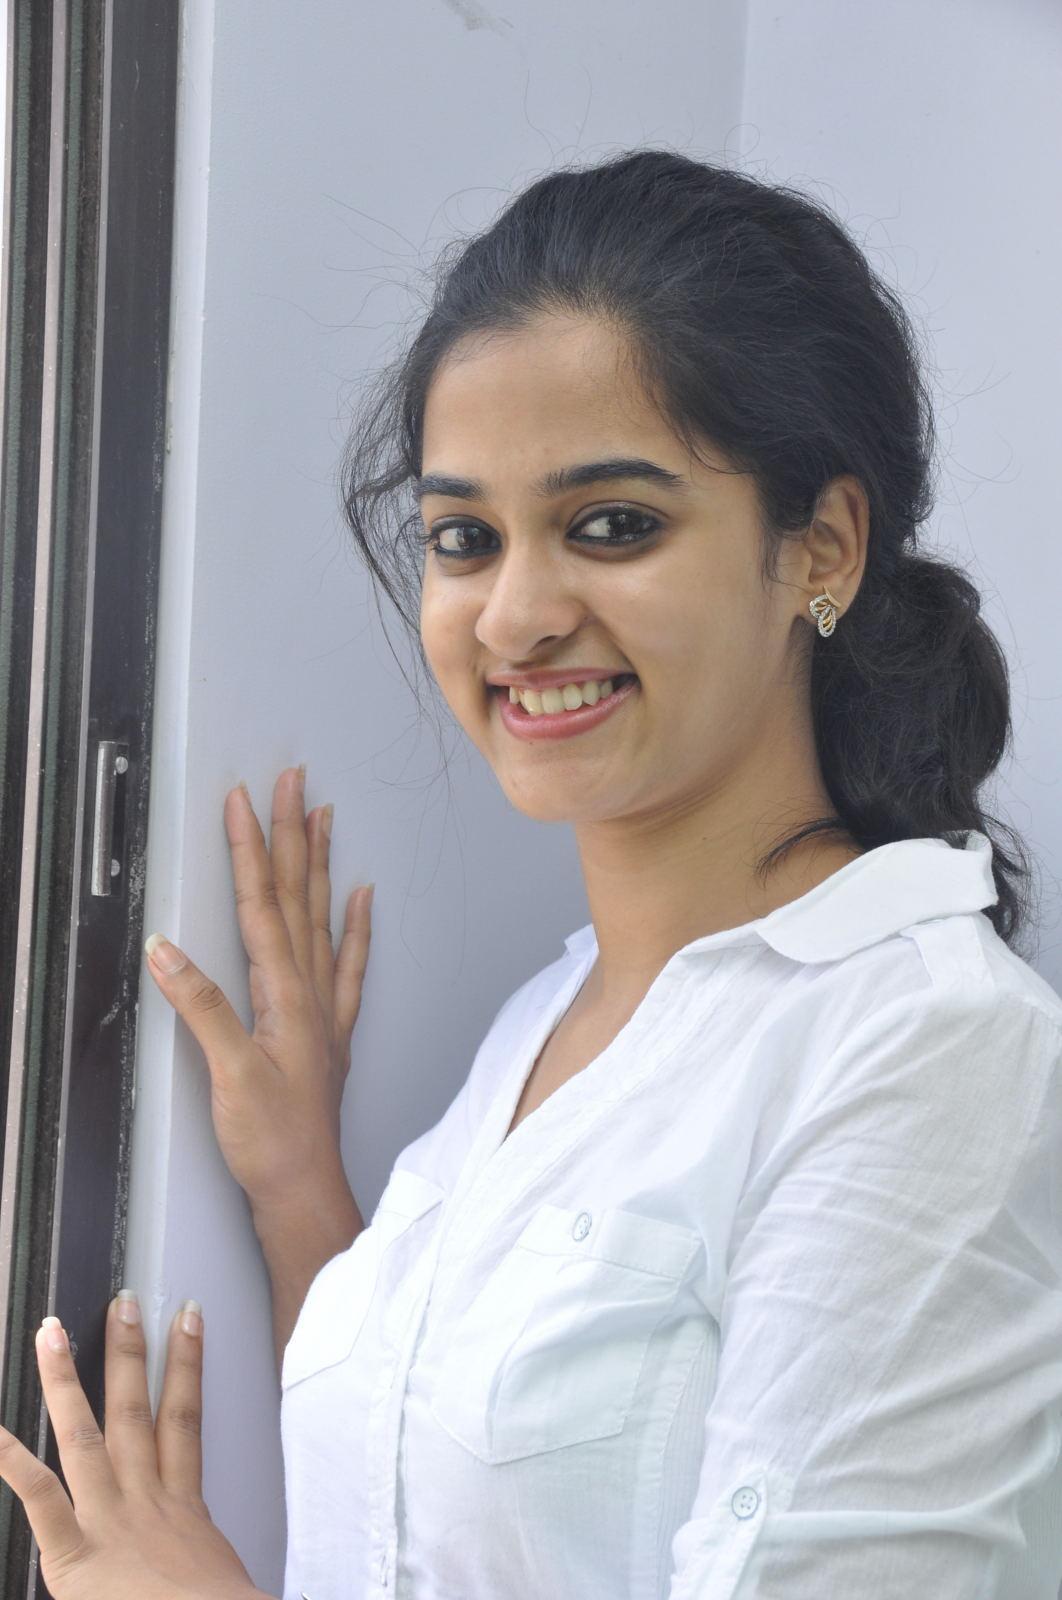 Cute sweet Nandita latest gorgeous photos in white shirt